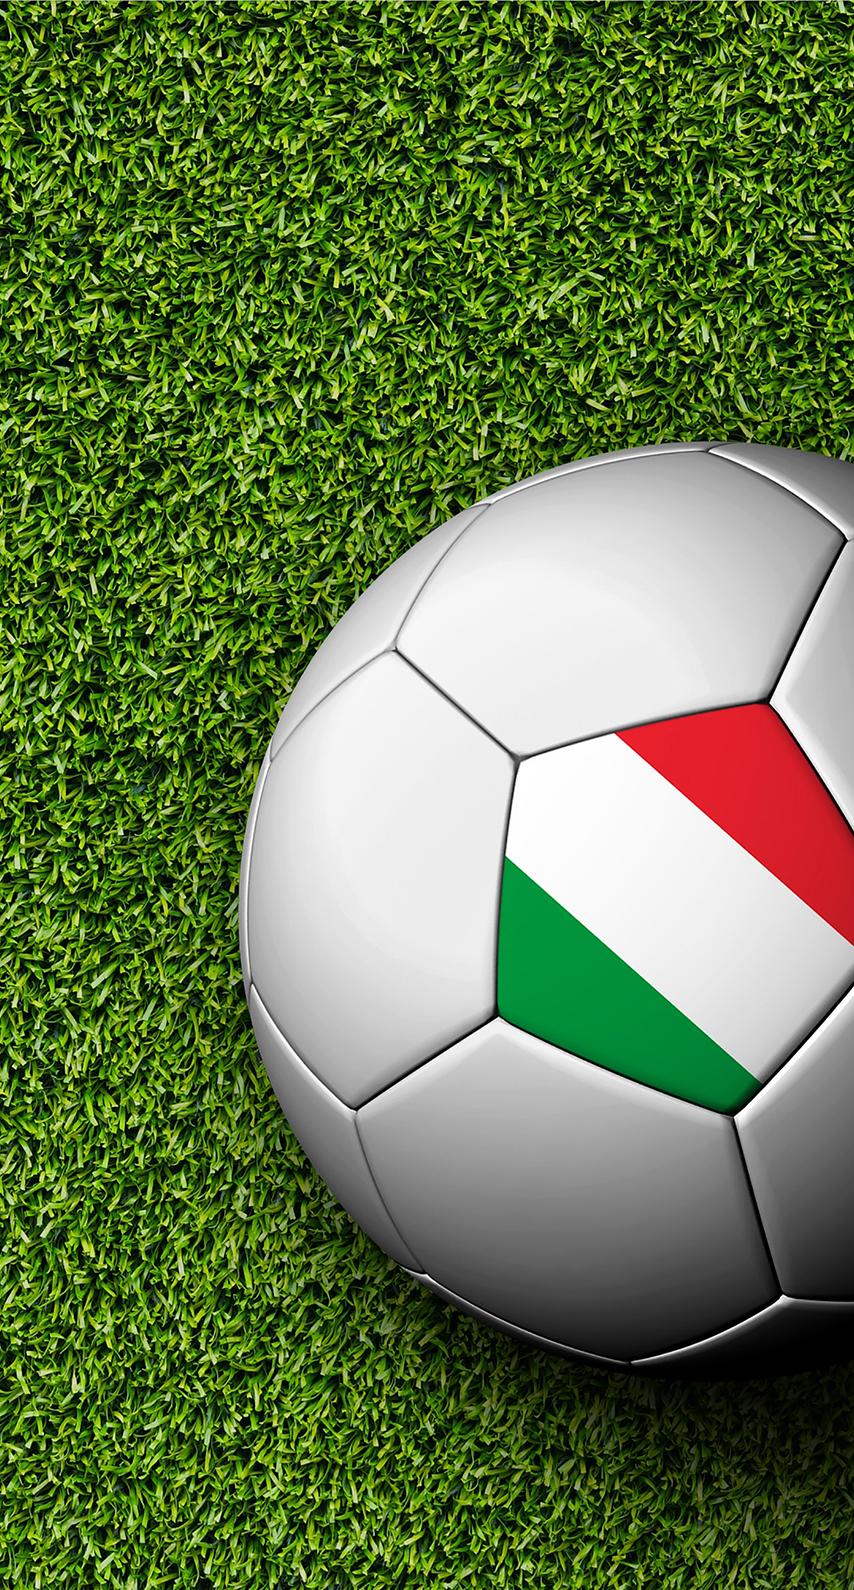 squad, soccer ball